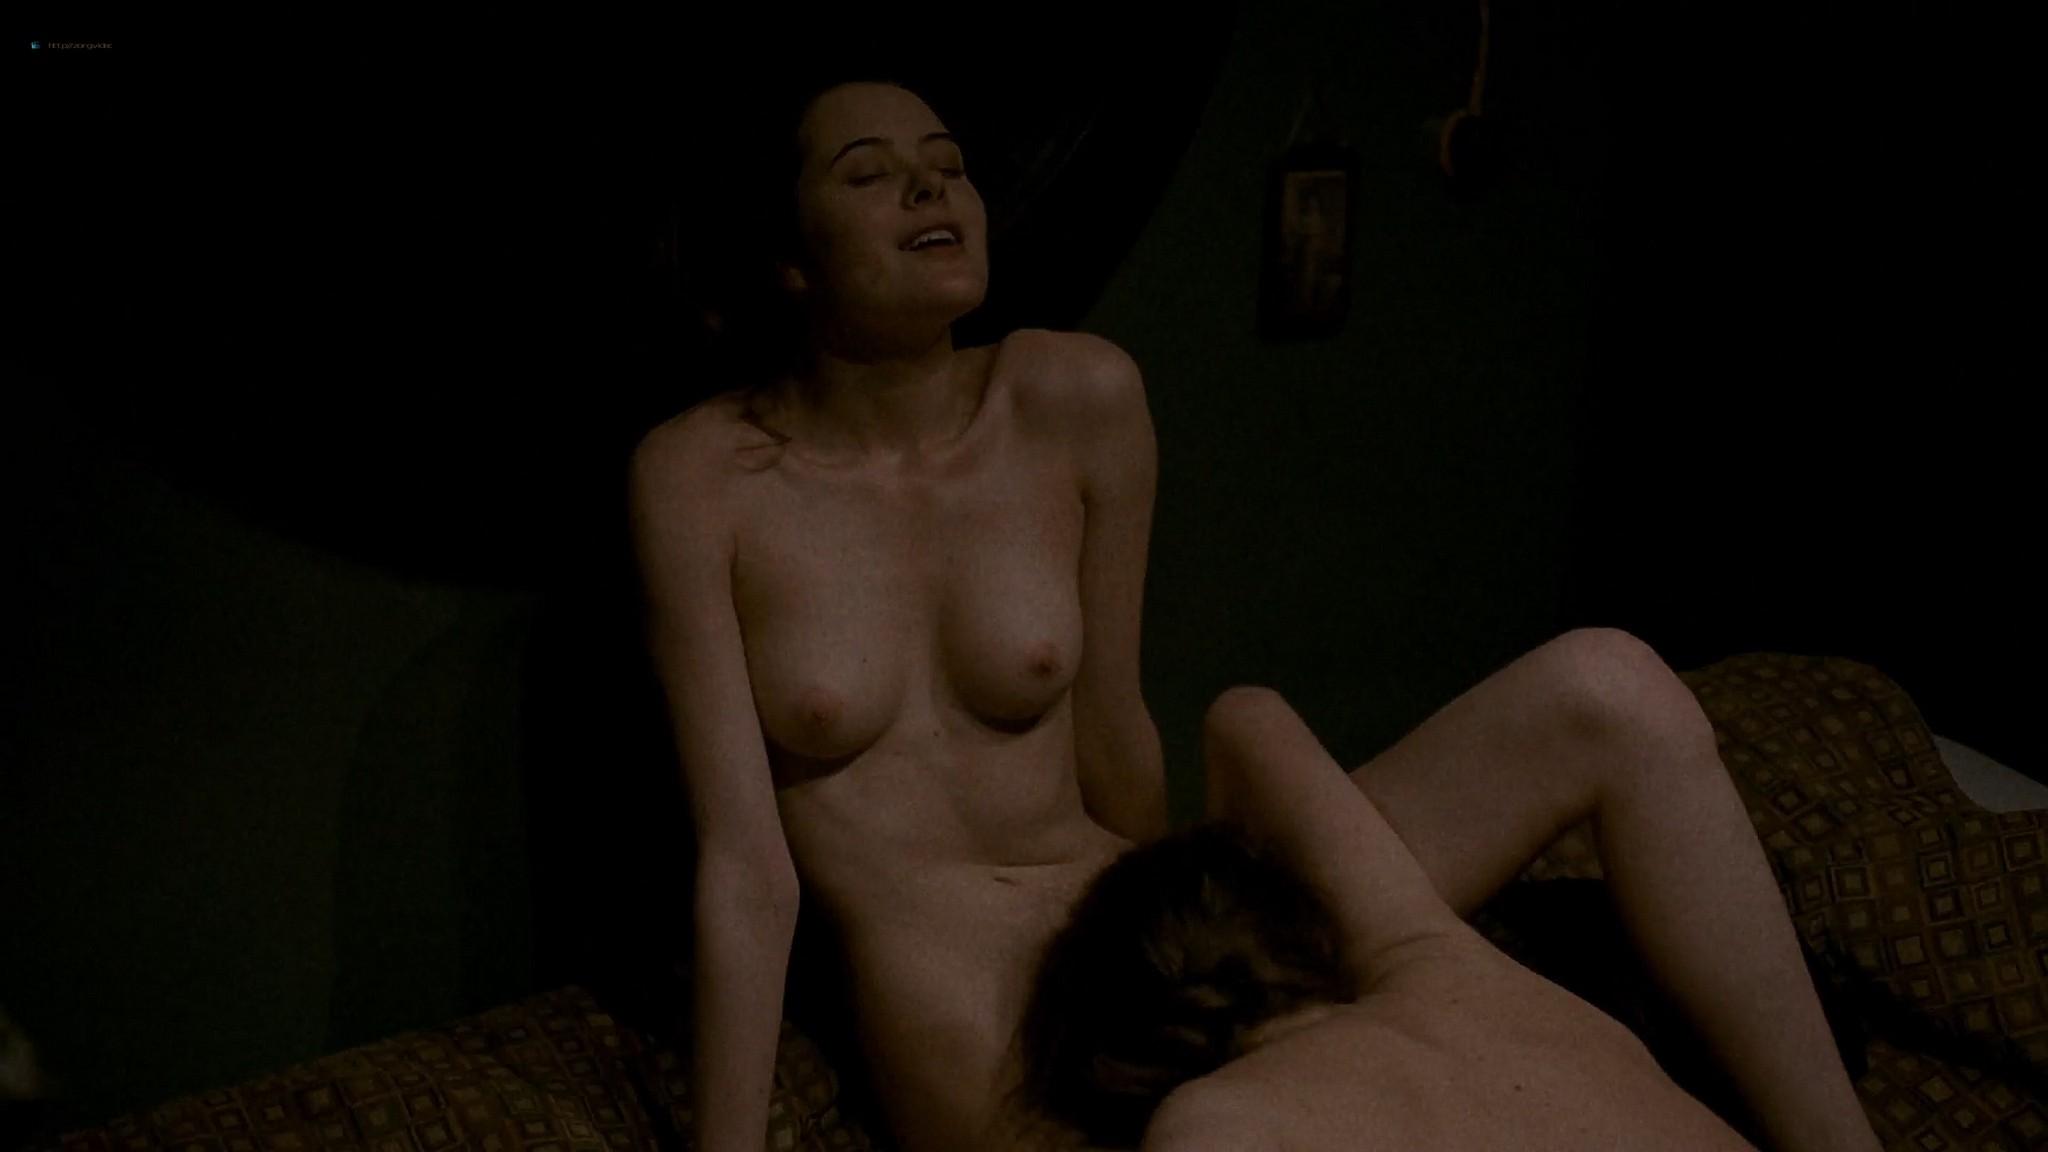 Ekaterina Yuspina nude explicit sex Tatyana Polozhiy, Radmila Shegoleva nude sex too - DAU Katya Tanya (2020) HD 1080p (4)